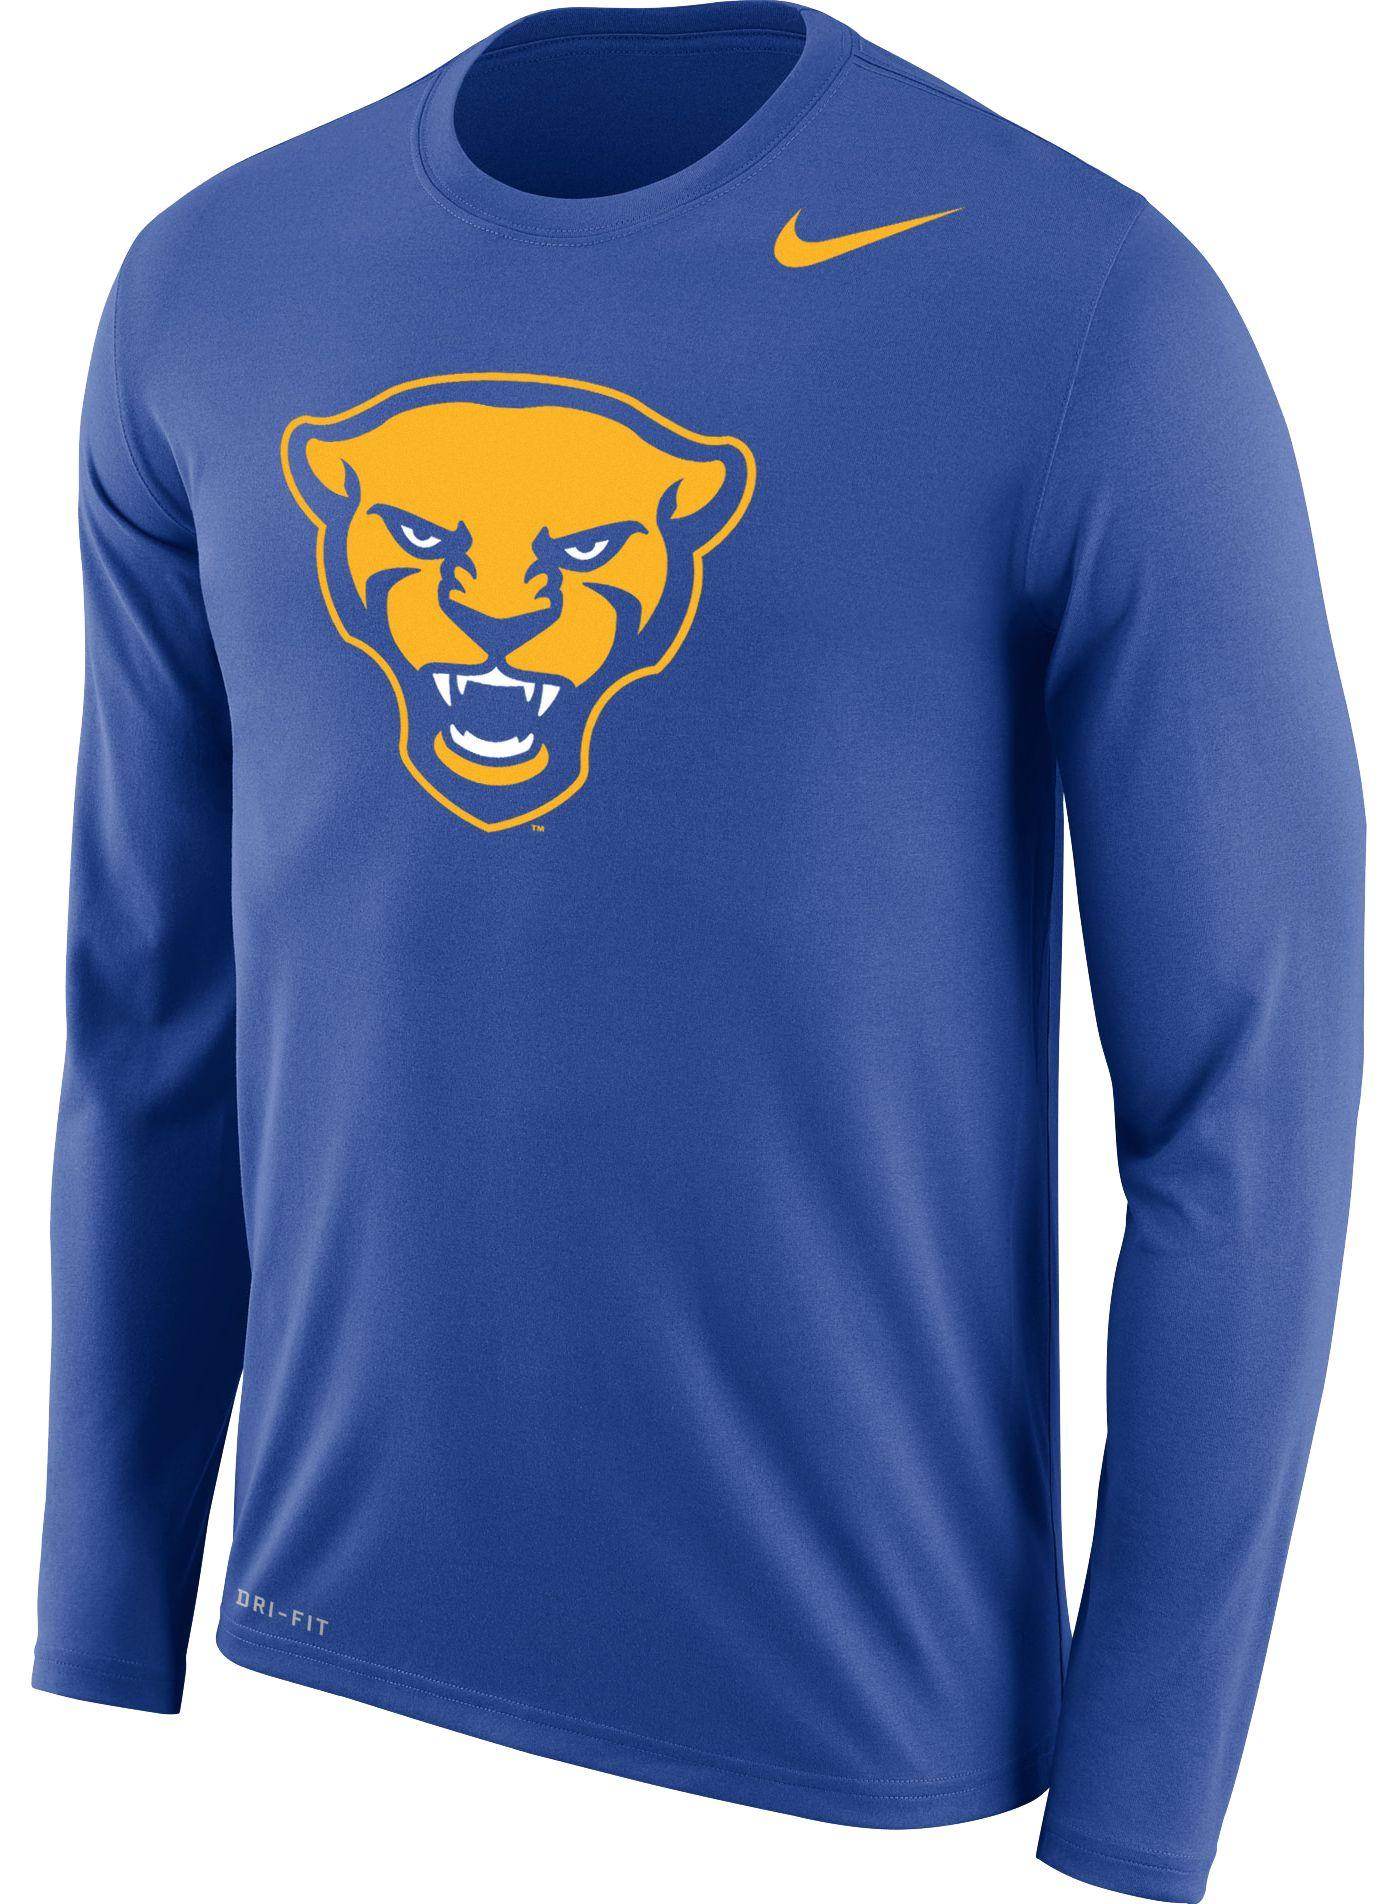 Nike Men's Pitt Panthers Blue Panther Head Logo Dri-FIT Cotton Long Sleeve T-Shirt